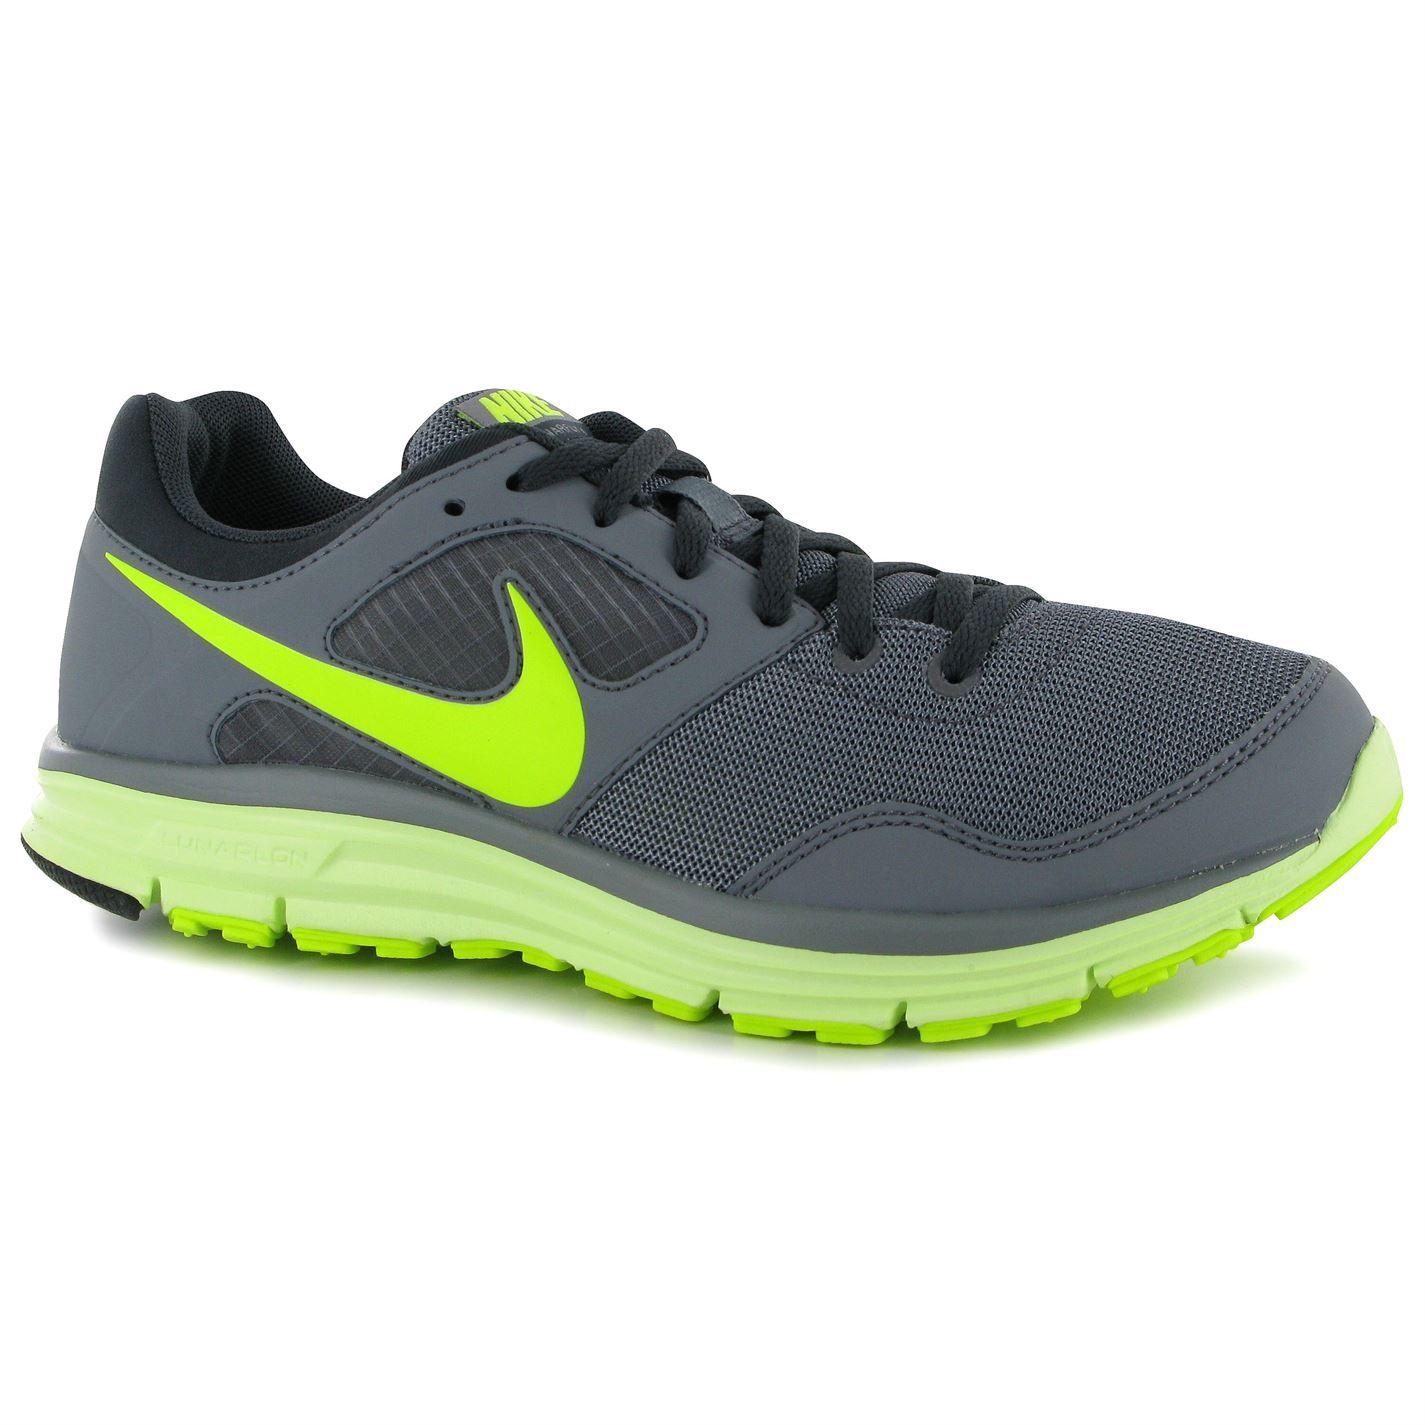 venta wiki nuevo descuento Nike Lunarfly 4 Amazon Amazon en línea realmente descuento exNh4XAmg